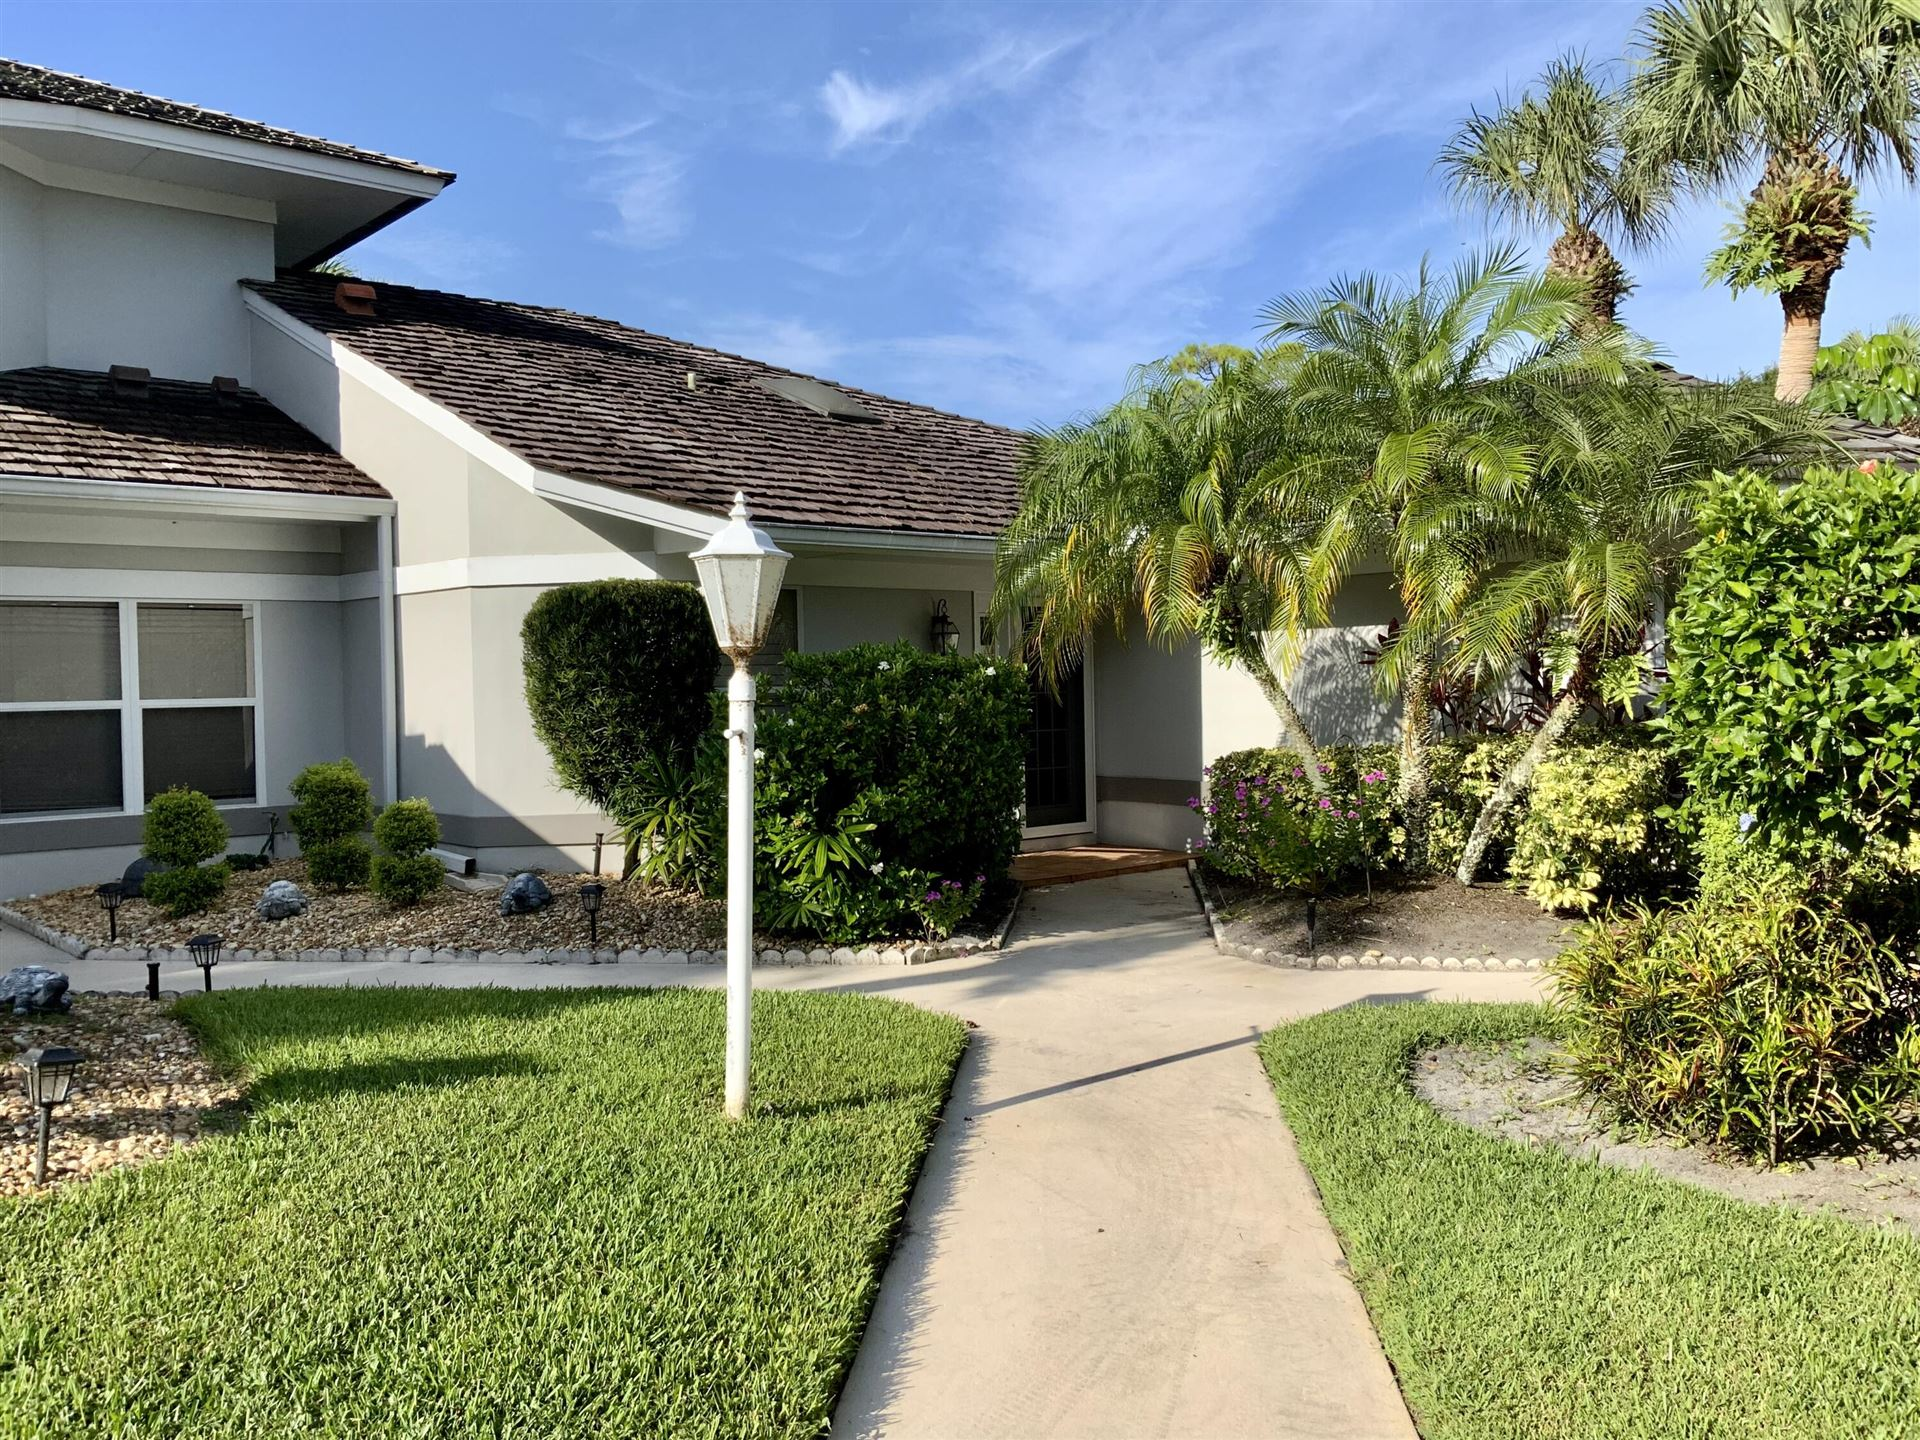 Photo of 7396 Pine Creek Way, Saint Lucie West, FL 34986 (MLS # RX-10729846)